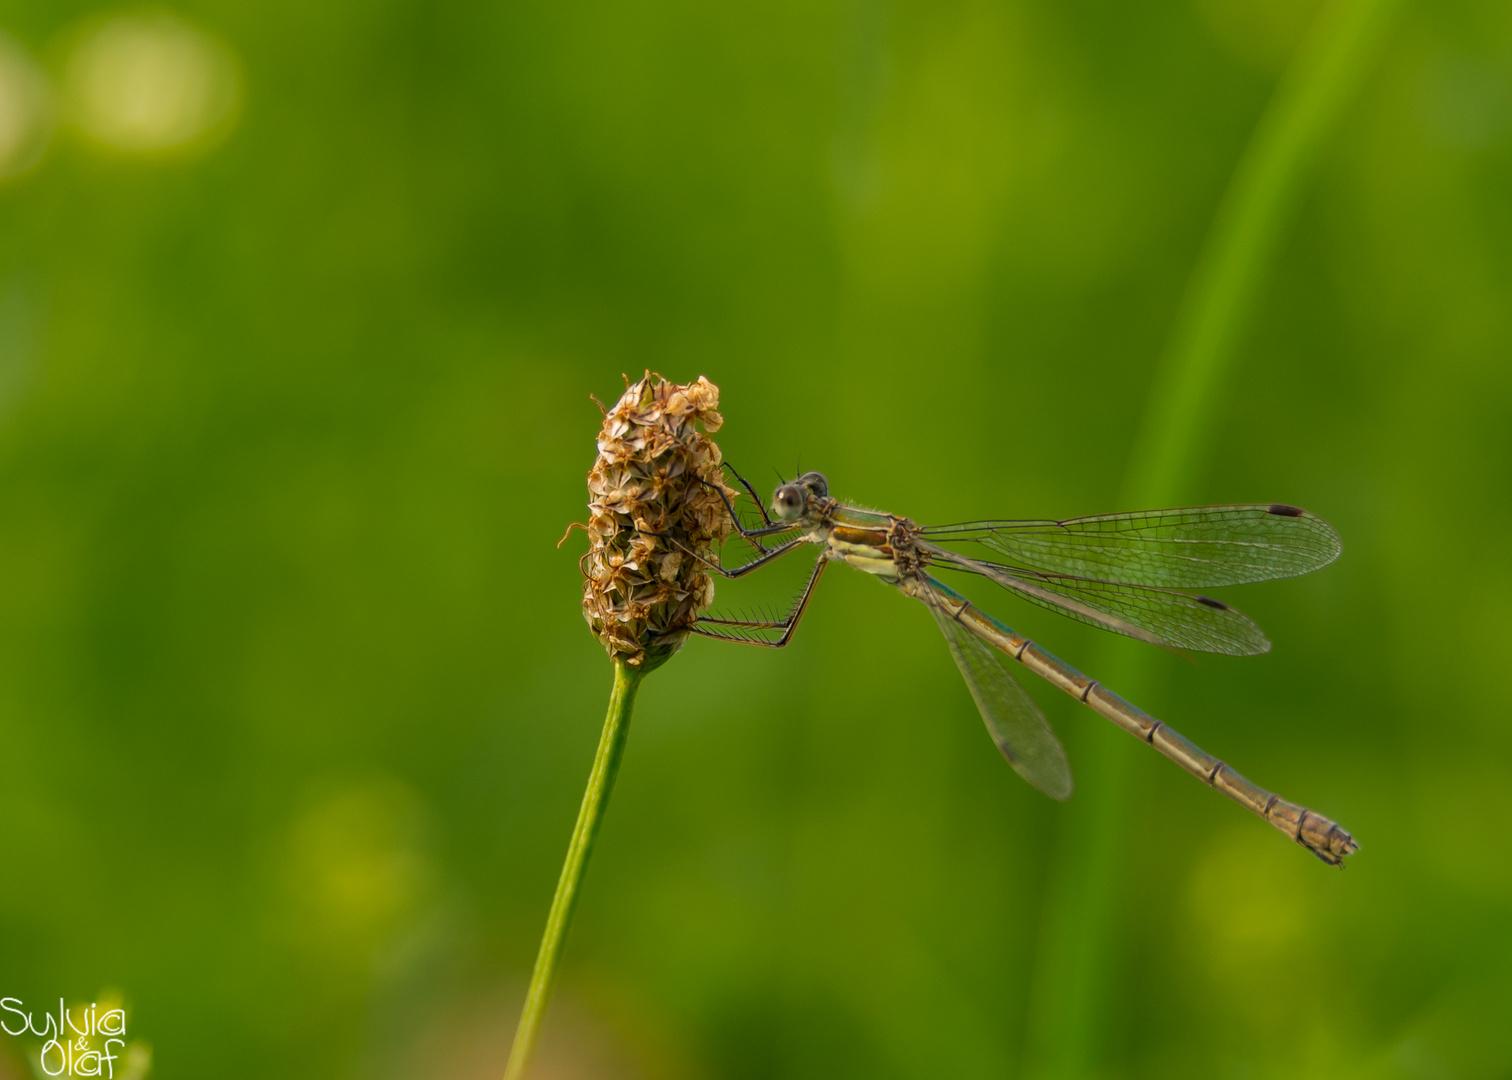 Libelle (Südliche Binsenjungfer) im Wind